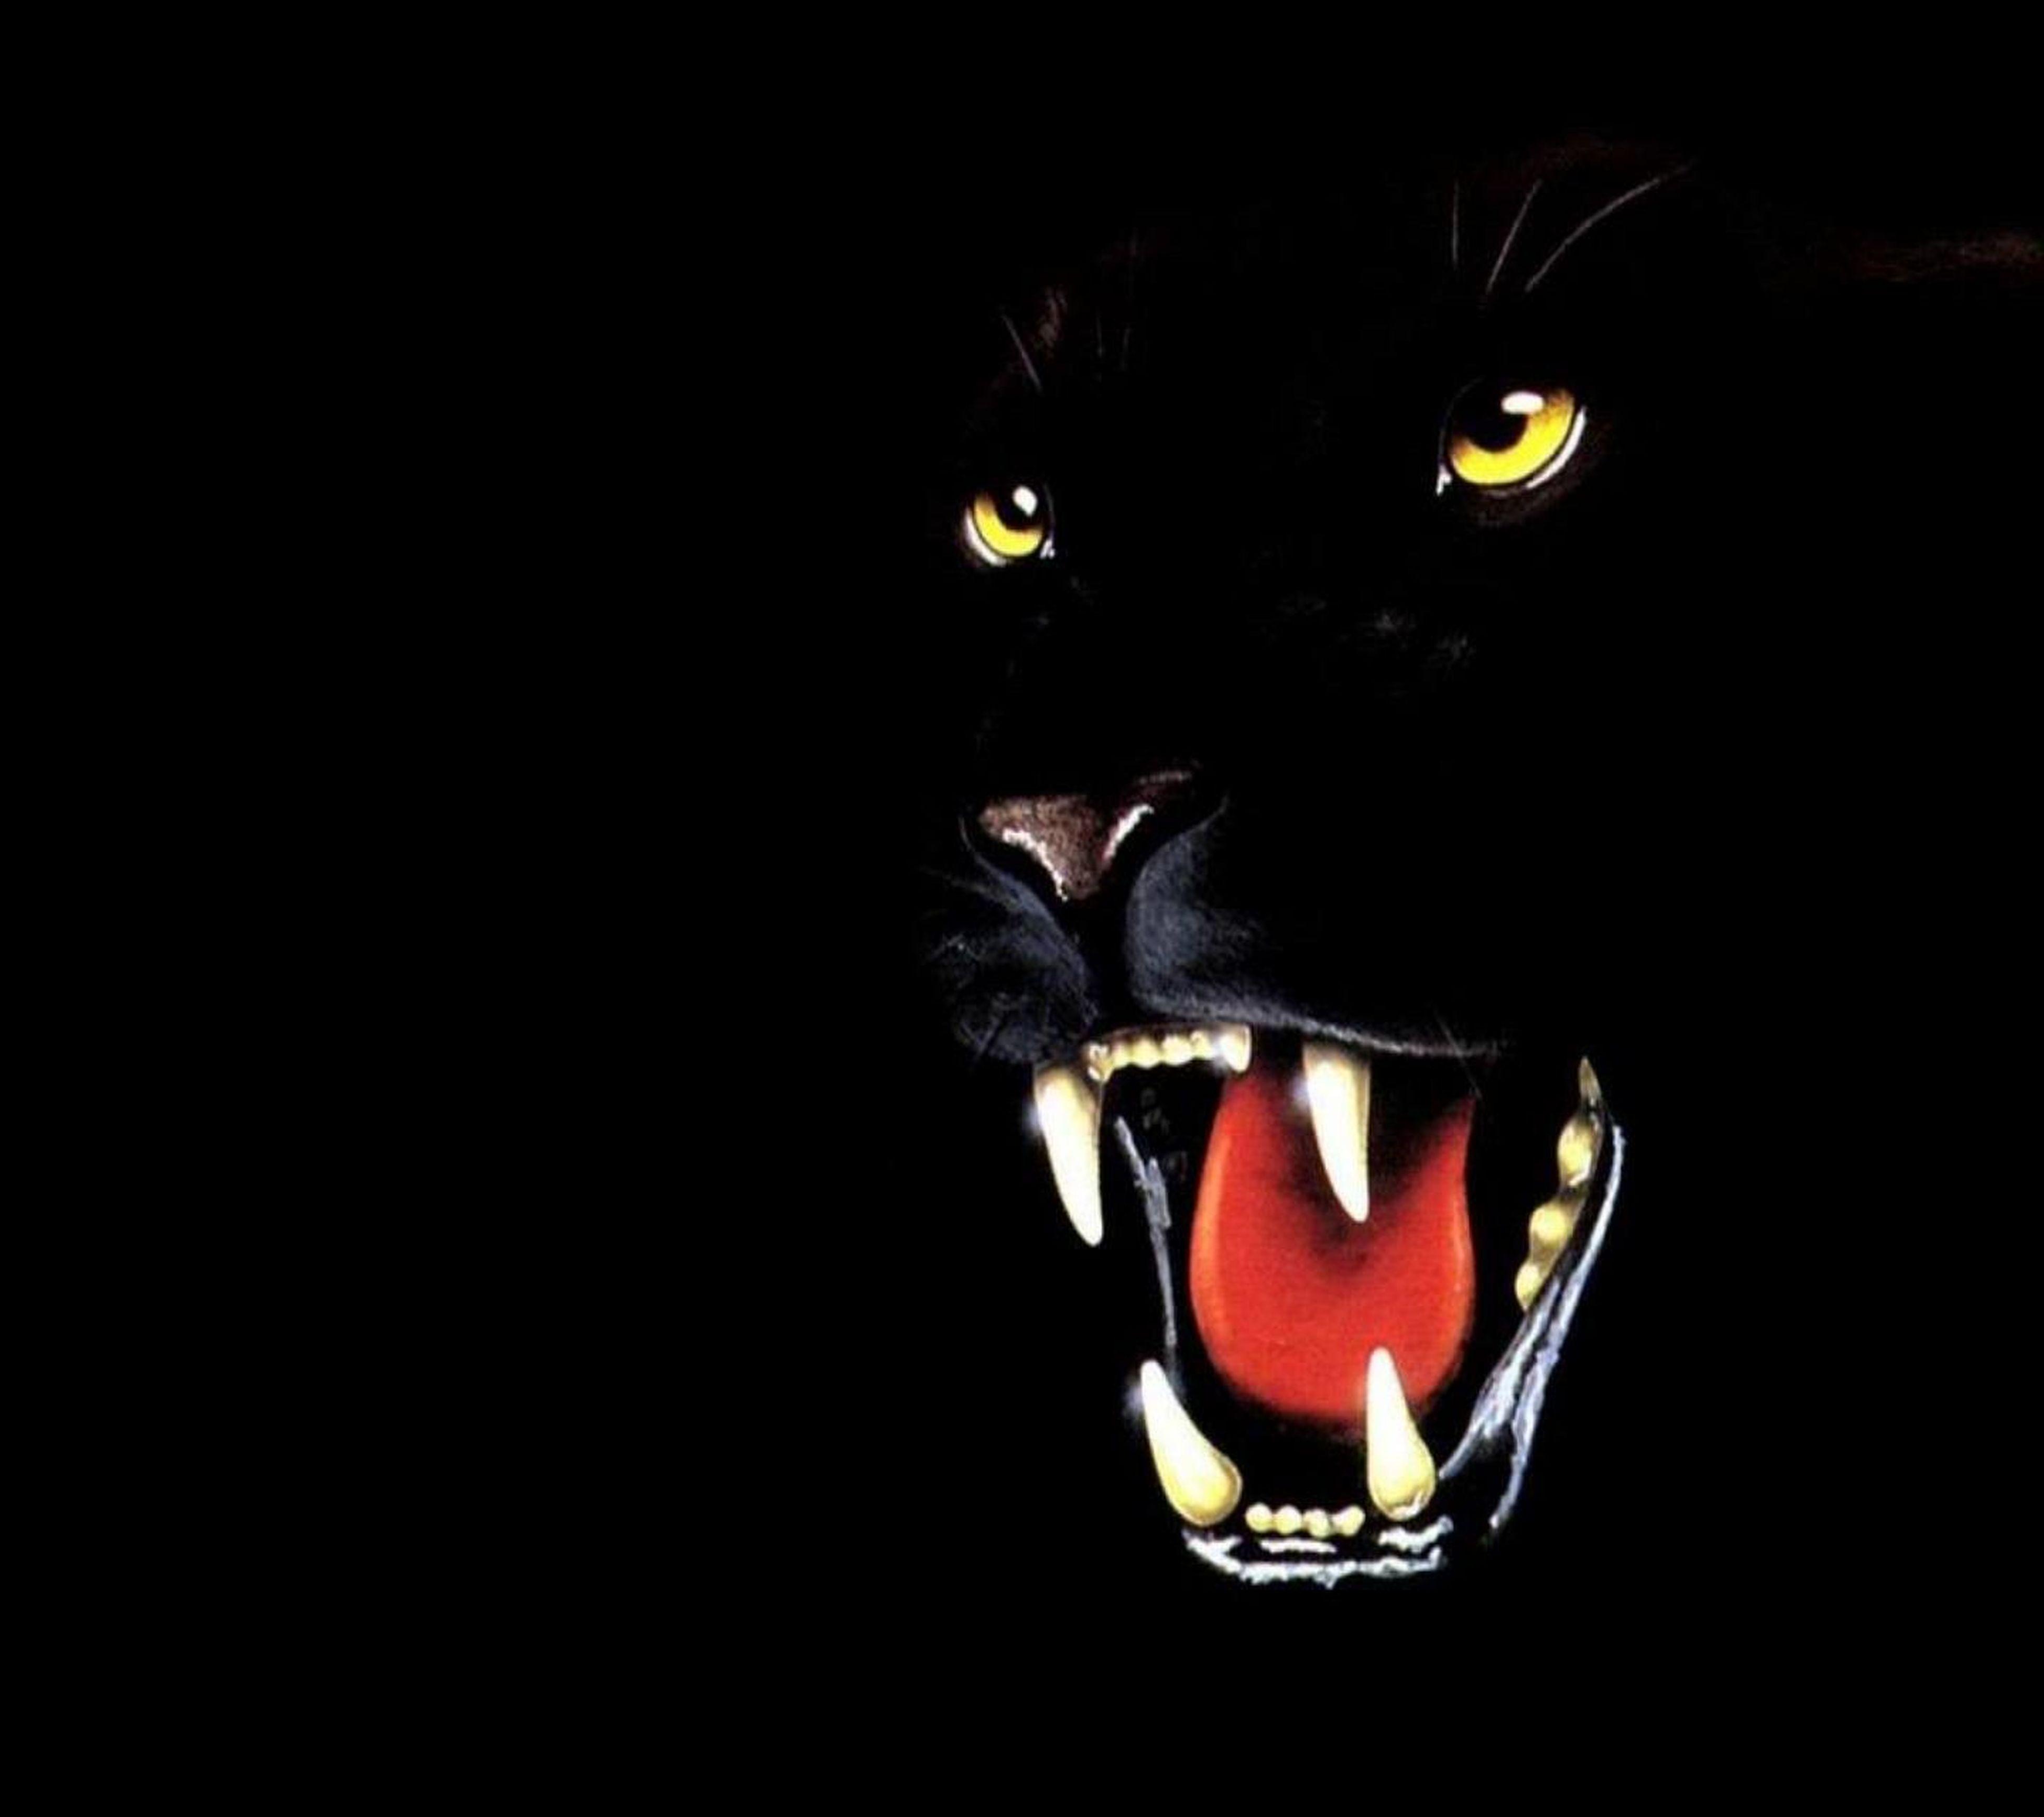 black background, studio shot, indoors, close-up, copy space, animal themes, pets, night, one animal, dark, cat, domestic cat, domestic animals, black color, darkroom, still life, no people, illuminated, feline, looking at camera